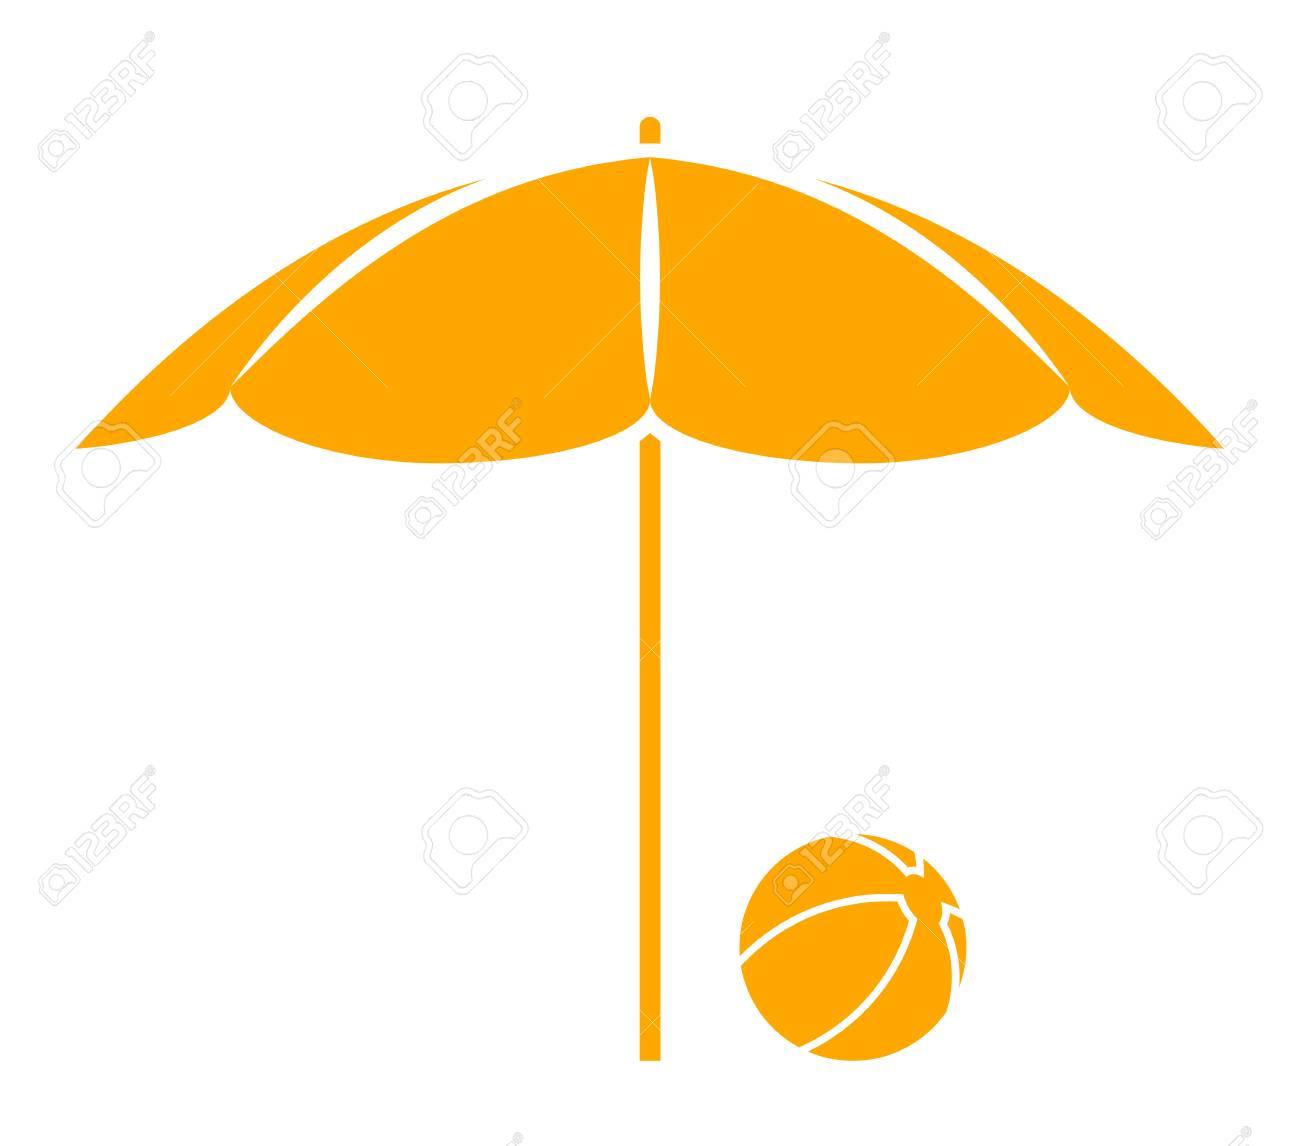 Beach Ball Under Beach Umbrella Isolated On White Background Royalty